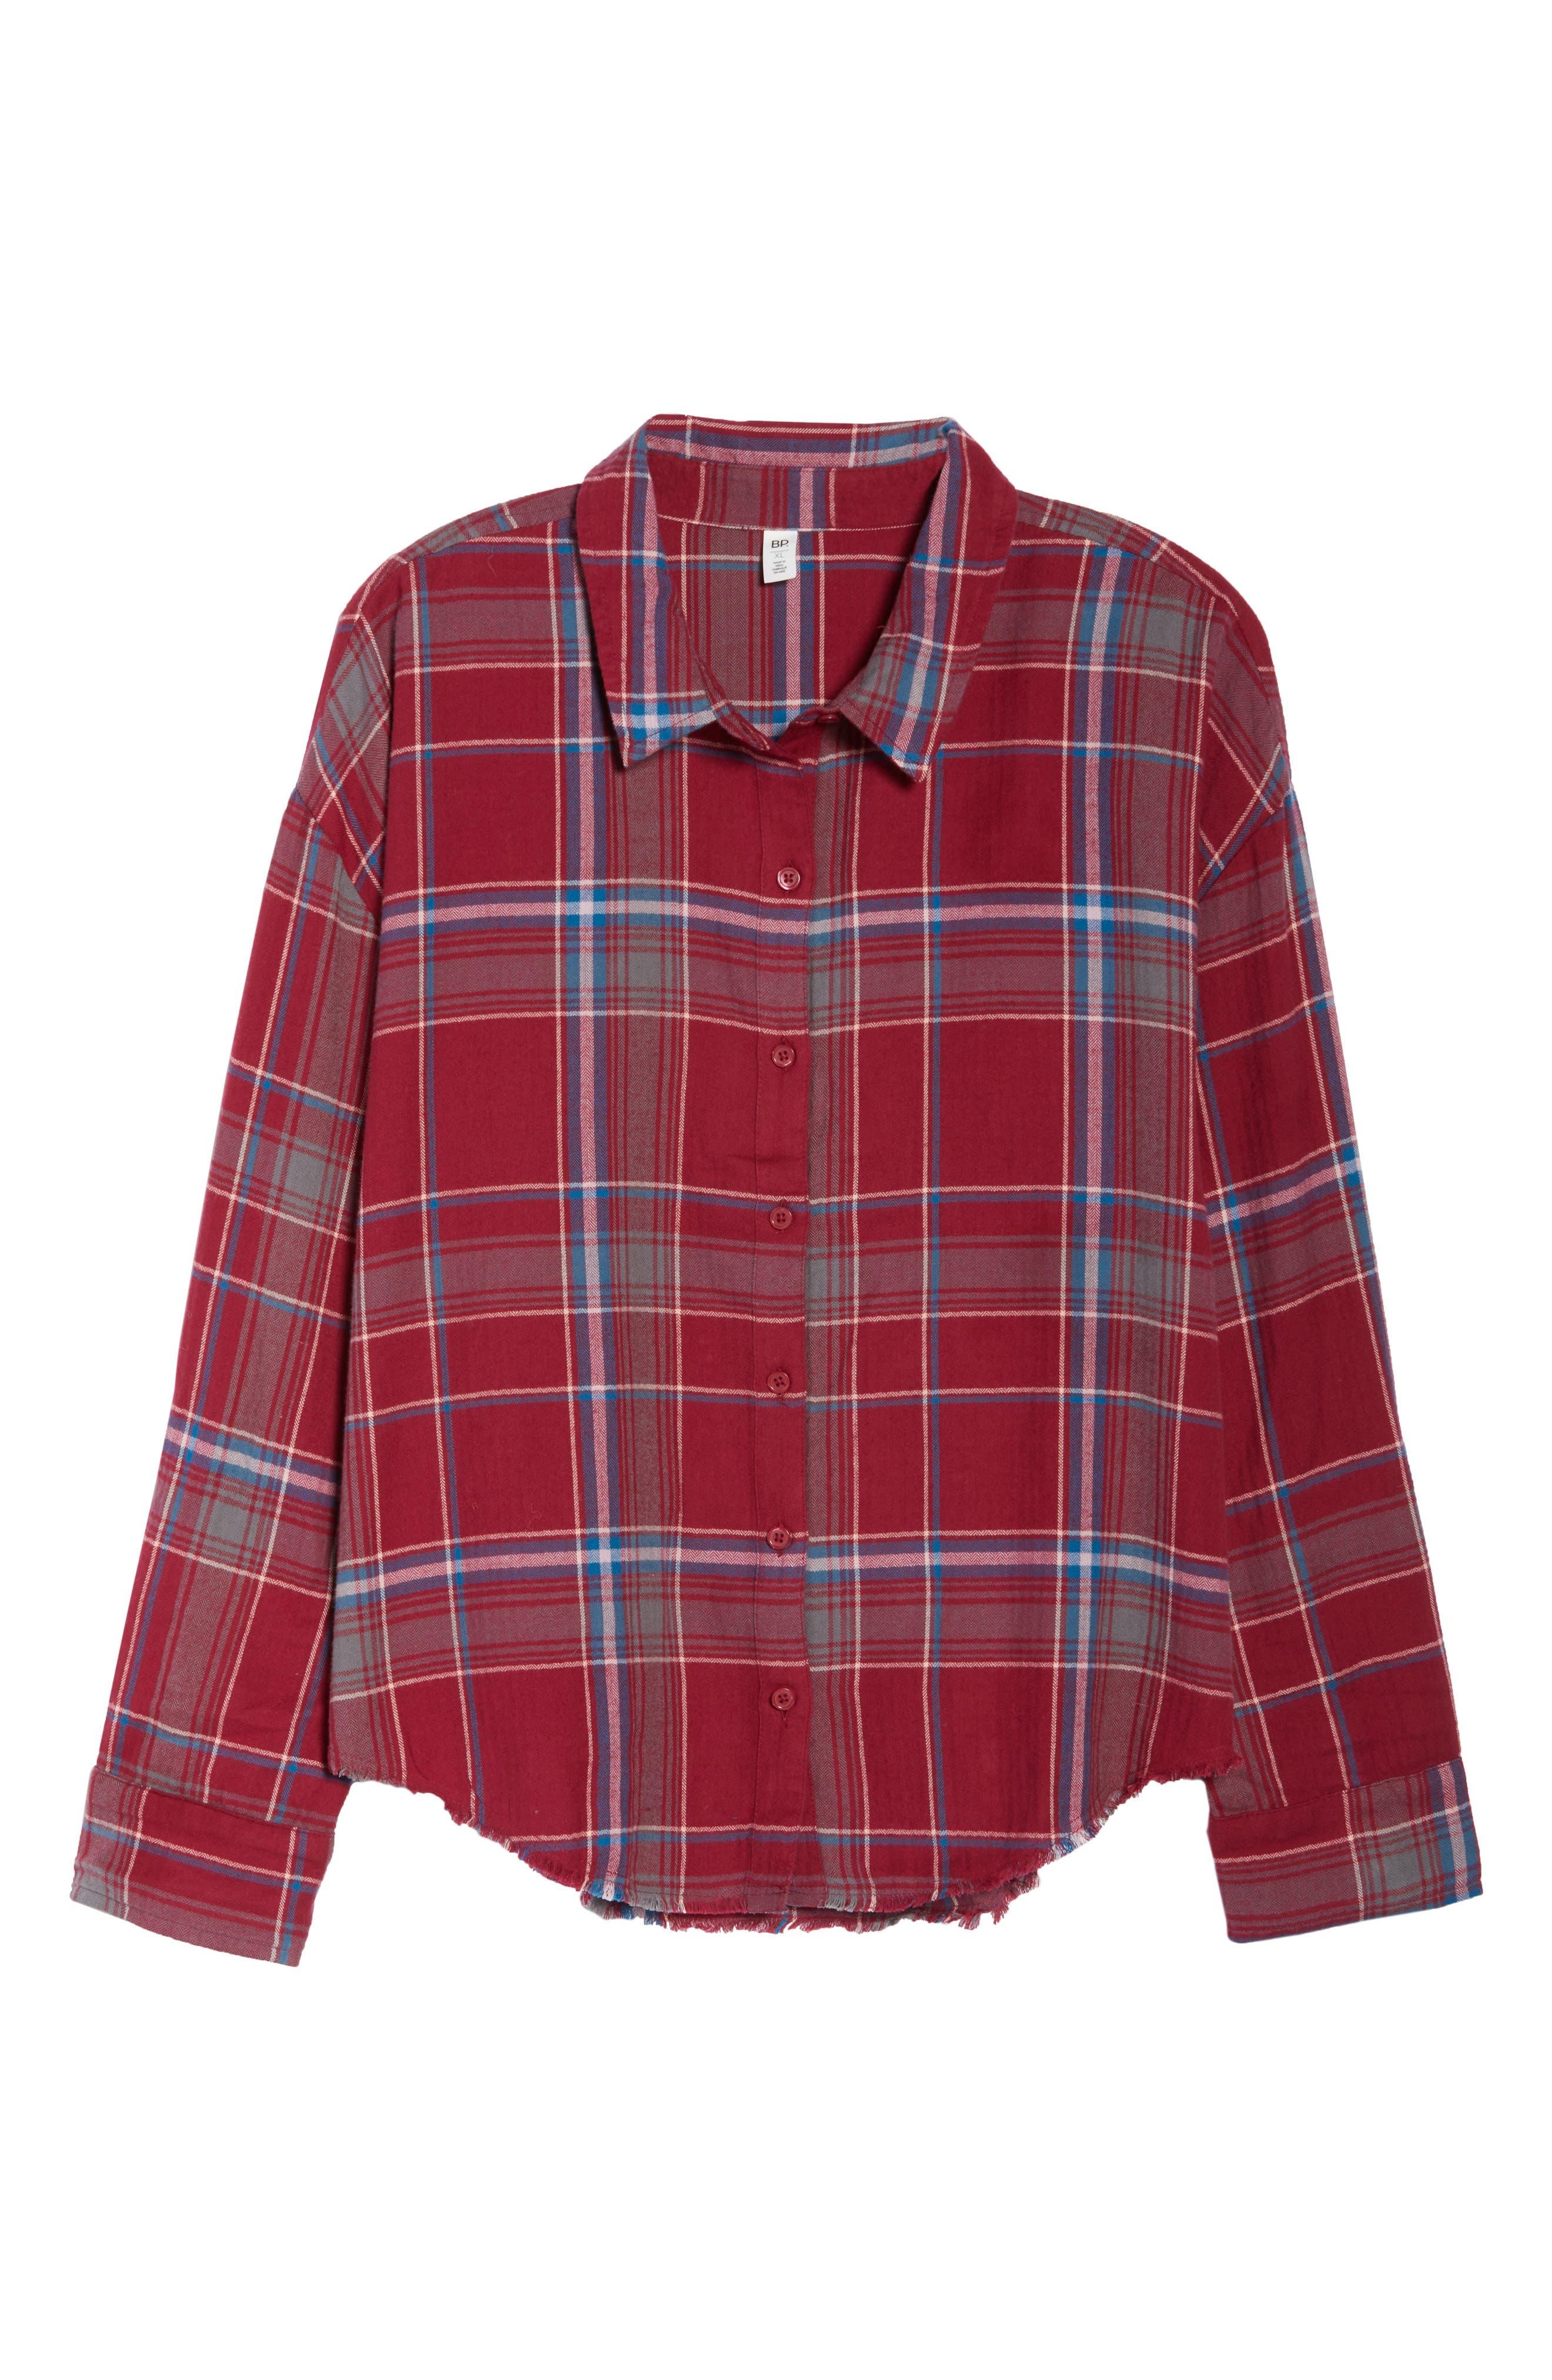 Frayed Edge Plaid Shirt,                             Alternate thumbnail 13, color,                             RED RUMBA NICOLE PLAID